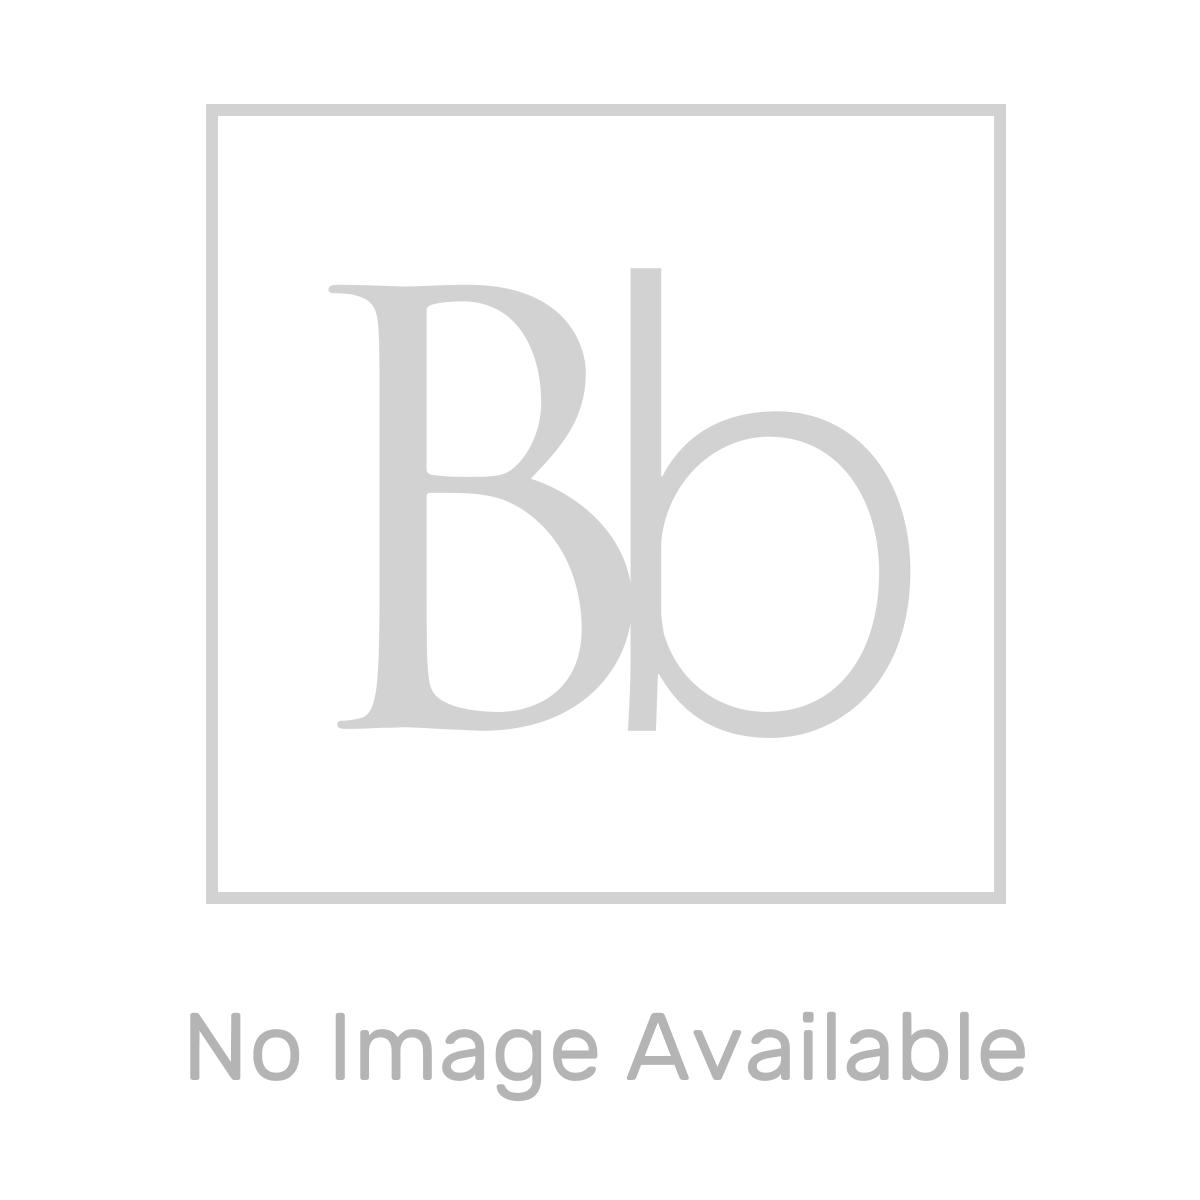 Premier High Gloss White WC Unit Dimensions